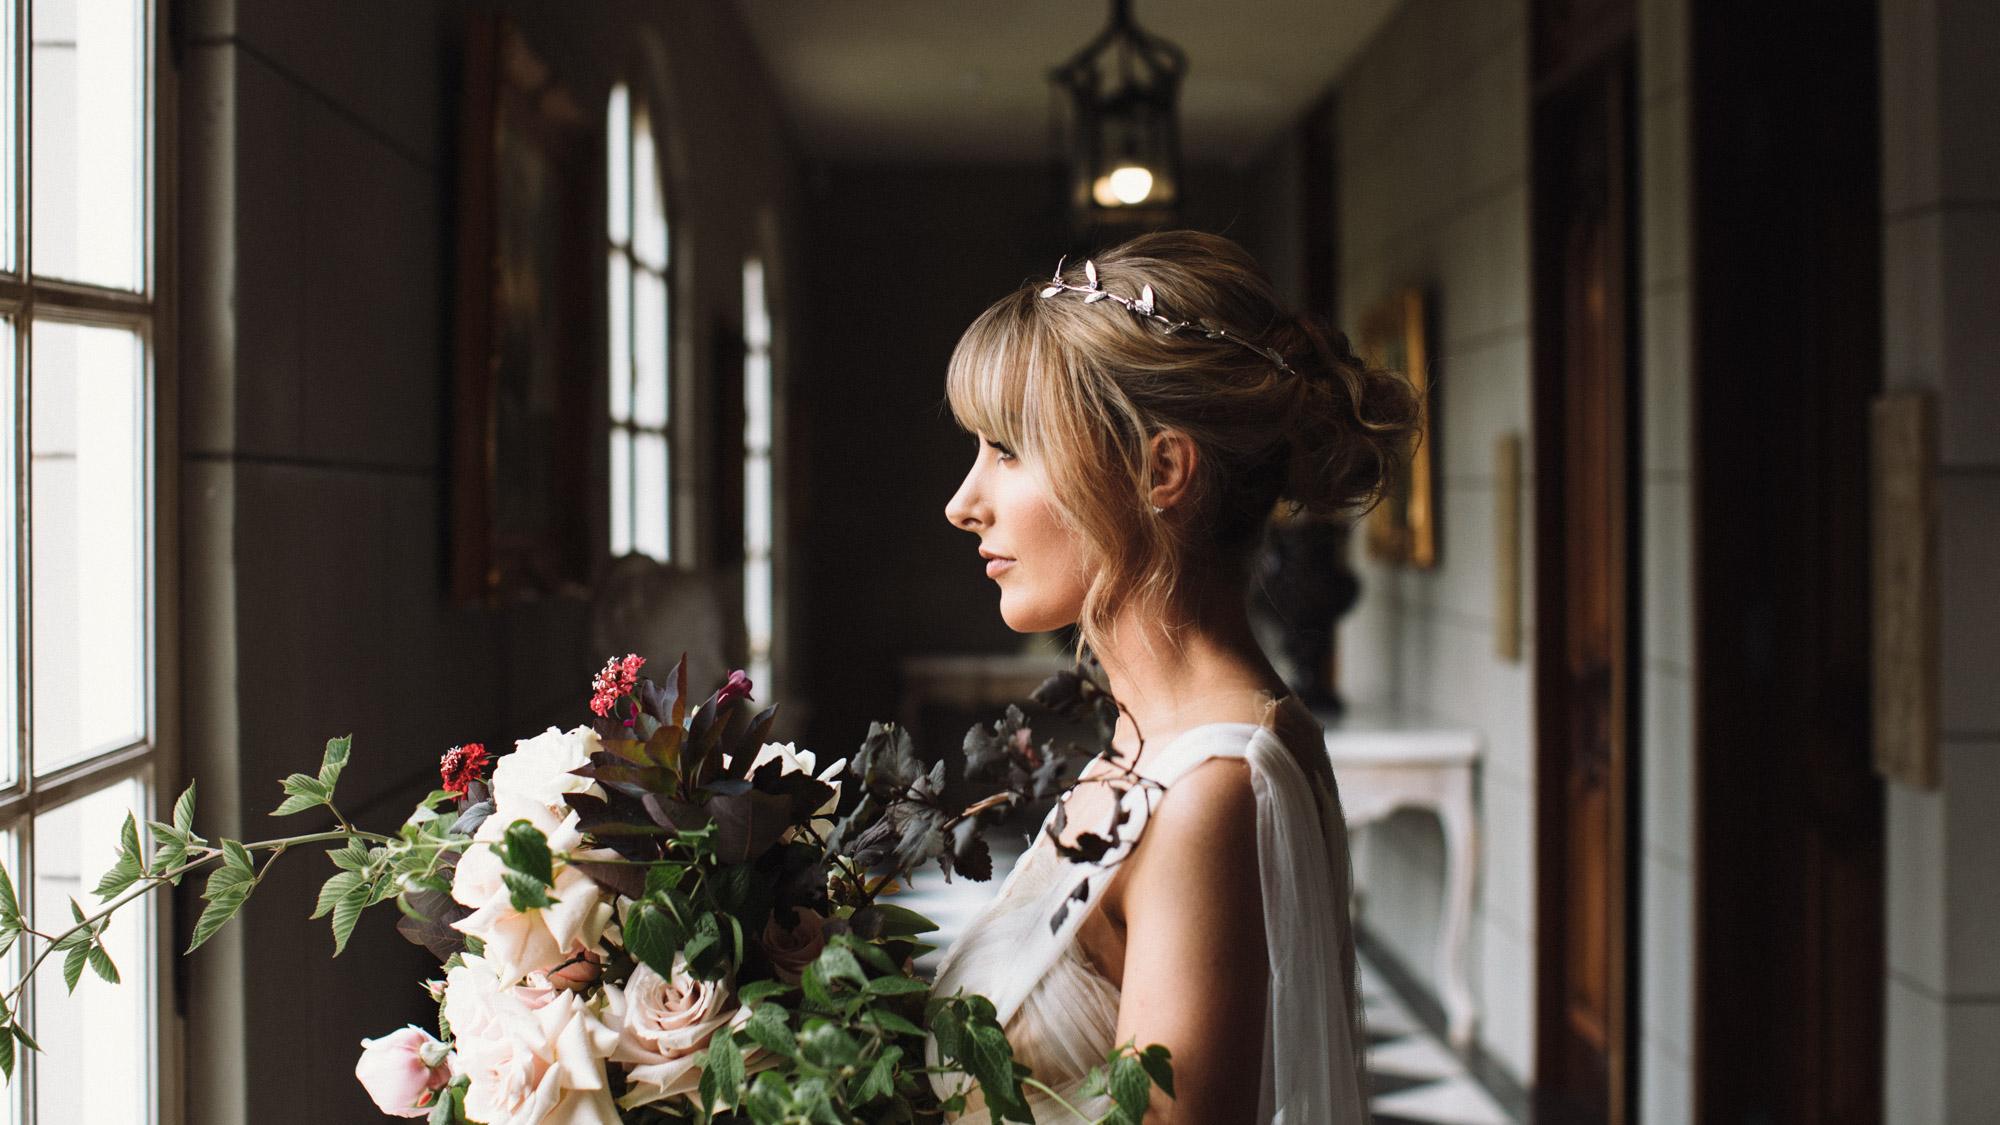 Campbell Point House Wedding HJ 18x9 + Dean Raphael-2.jpg